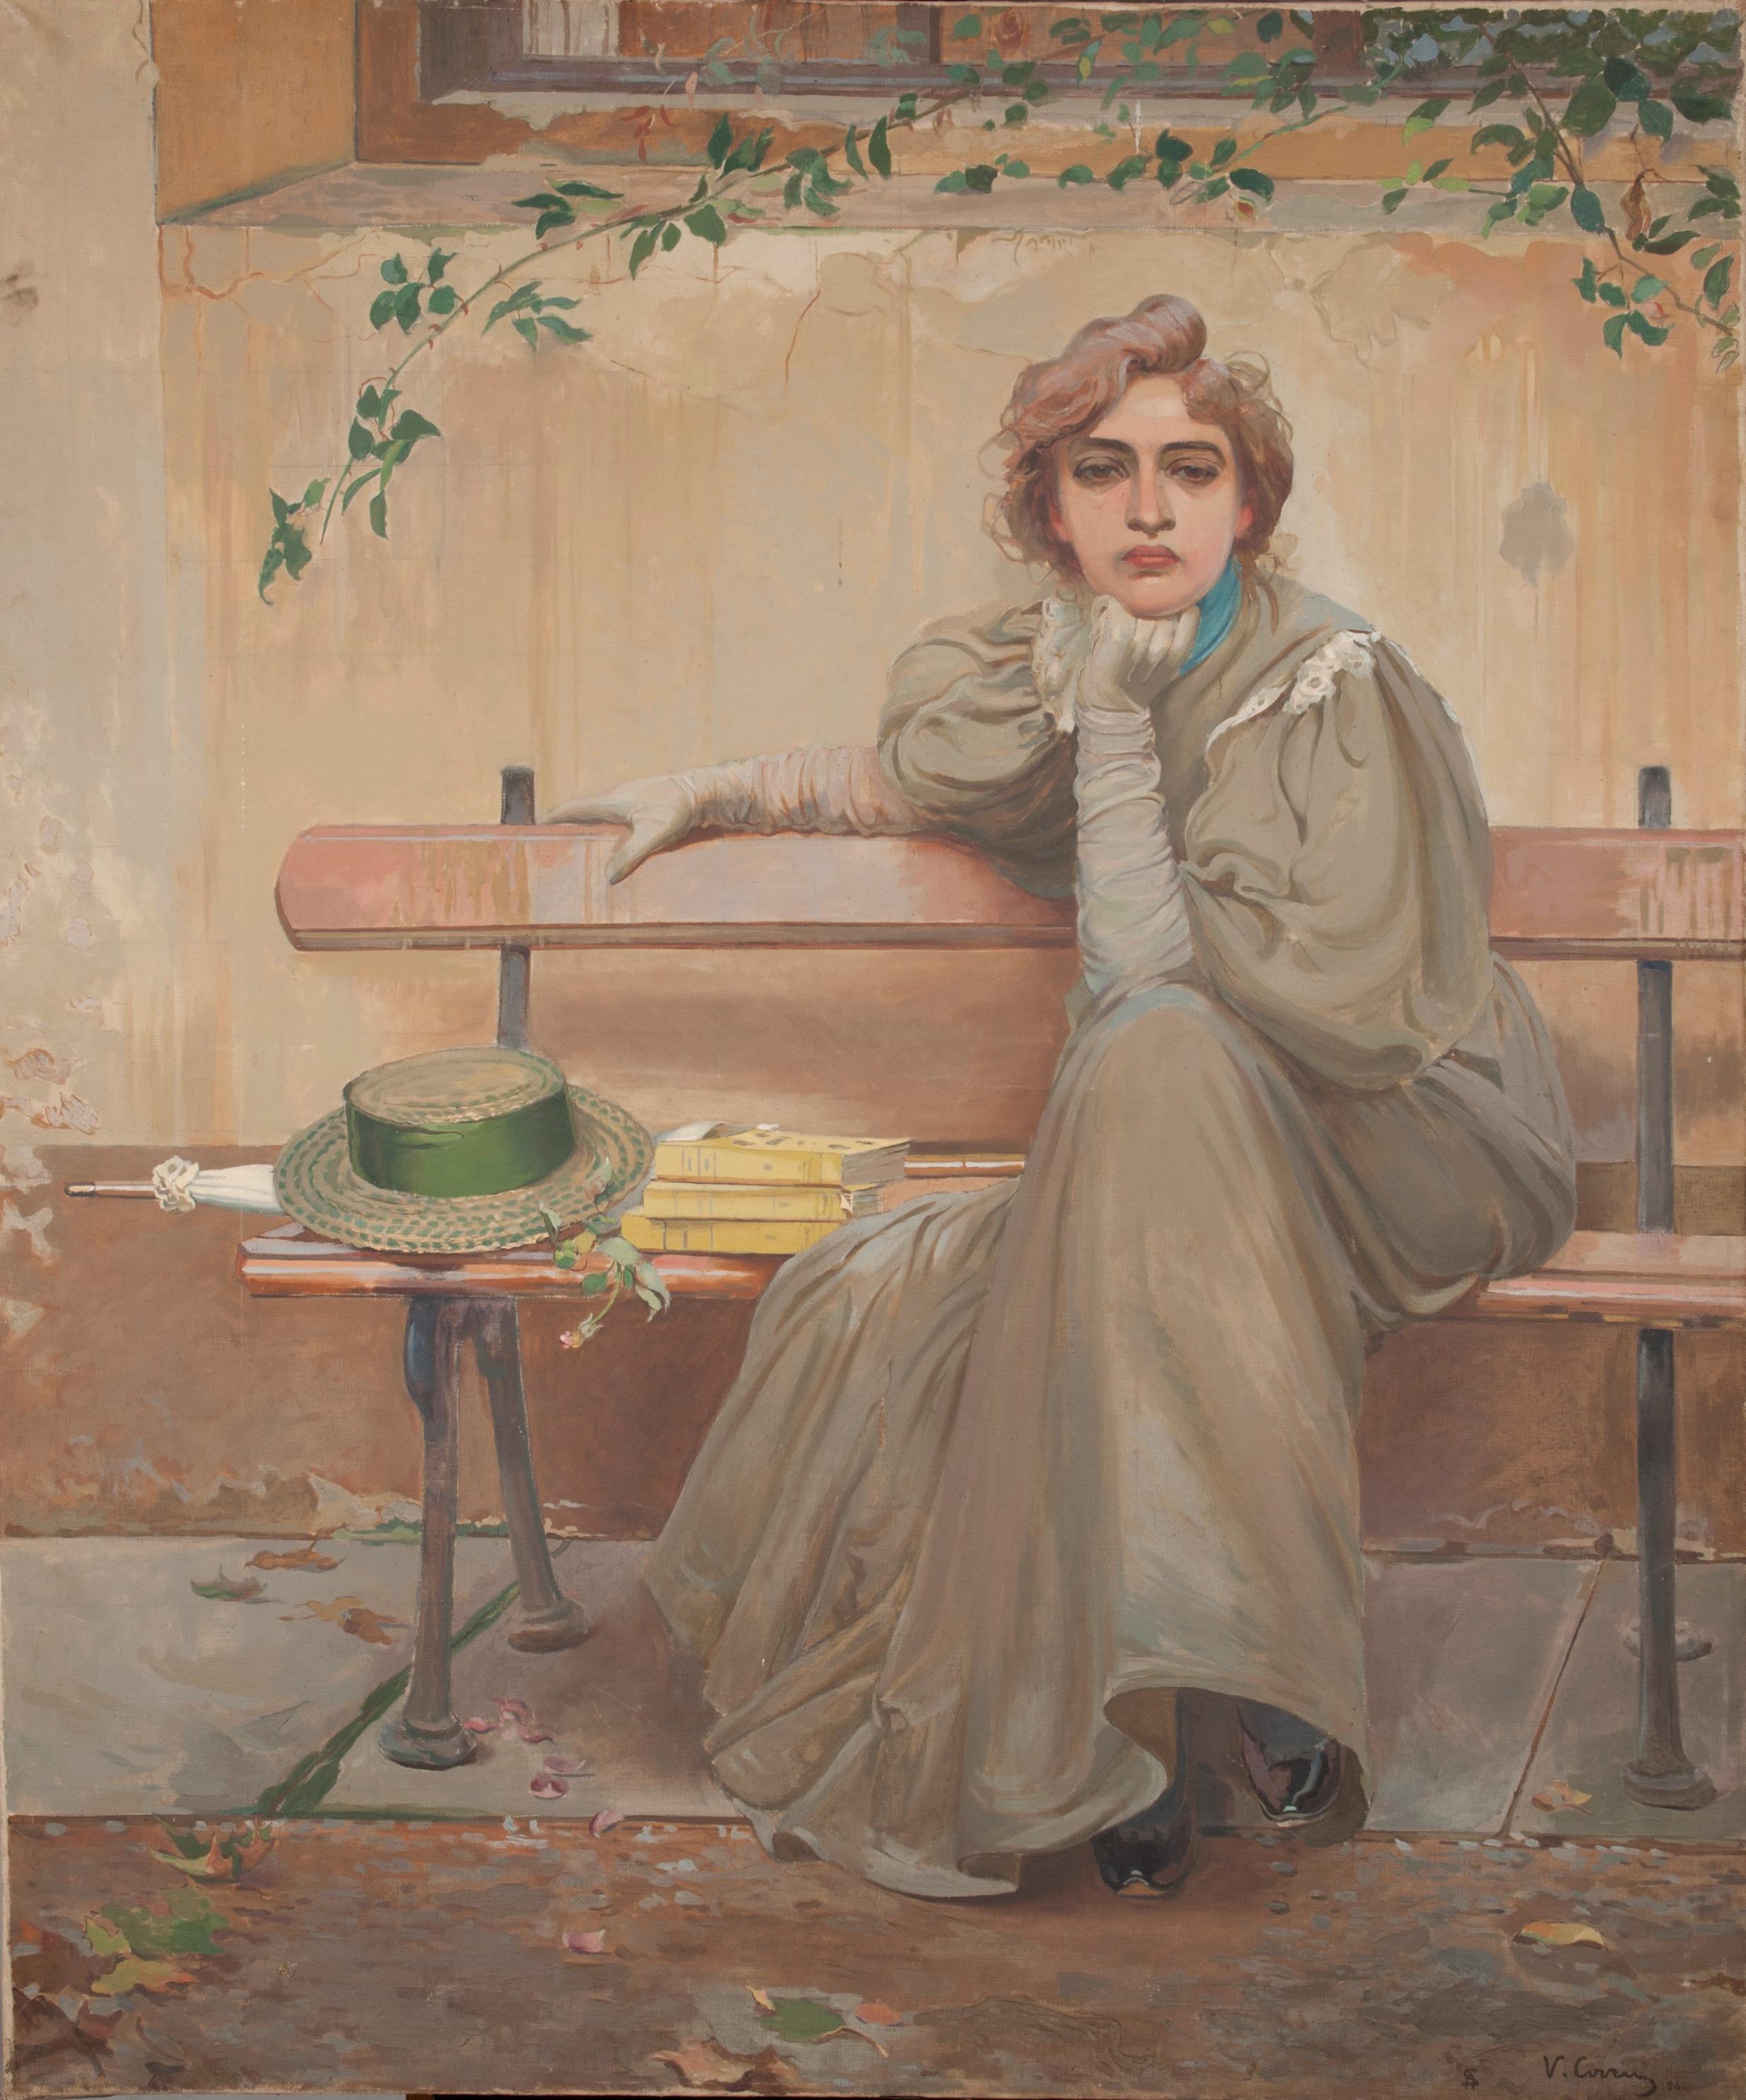 Vittorio Matteo Corcos, Dreams, 1896